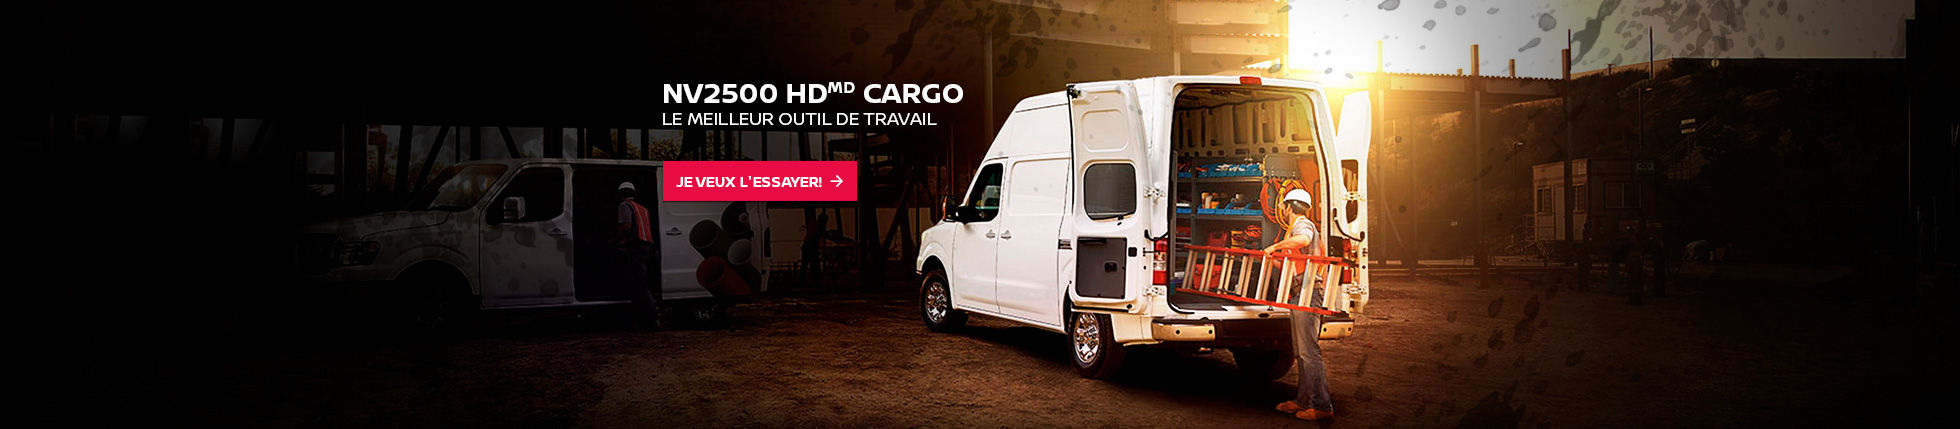 NV 2500 Cargo